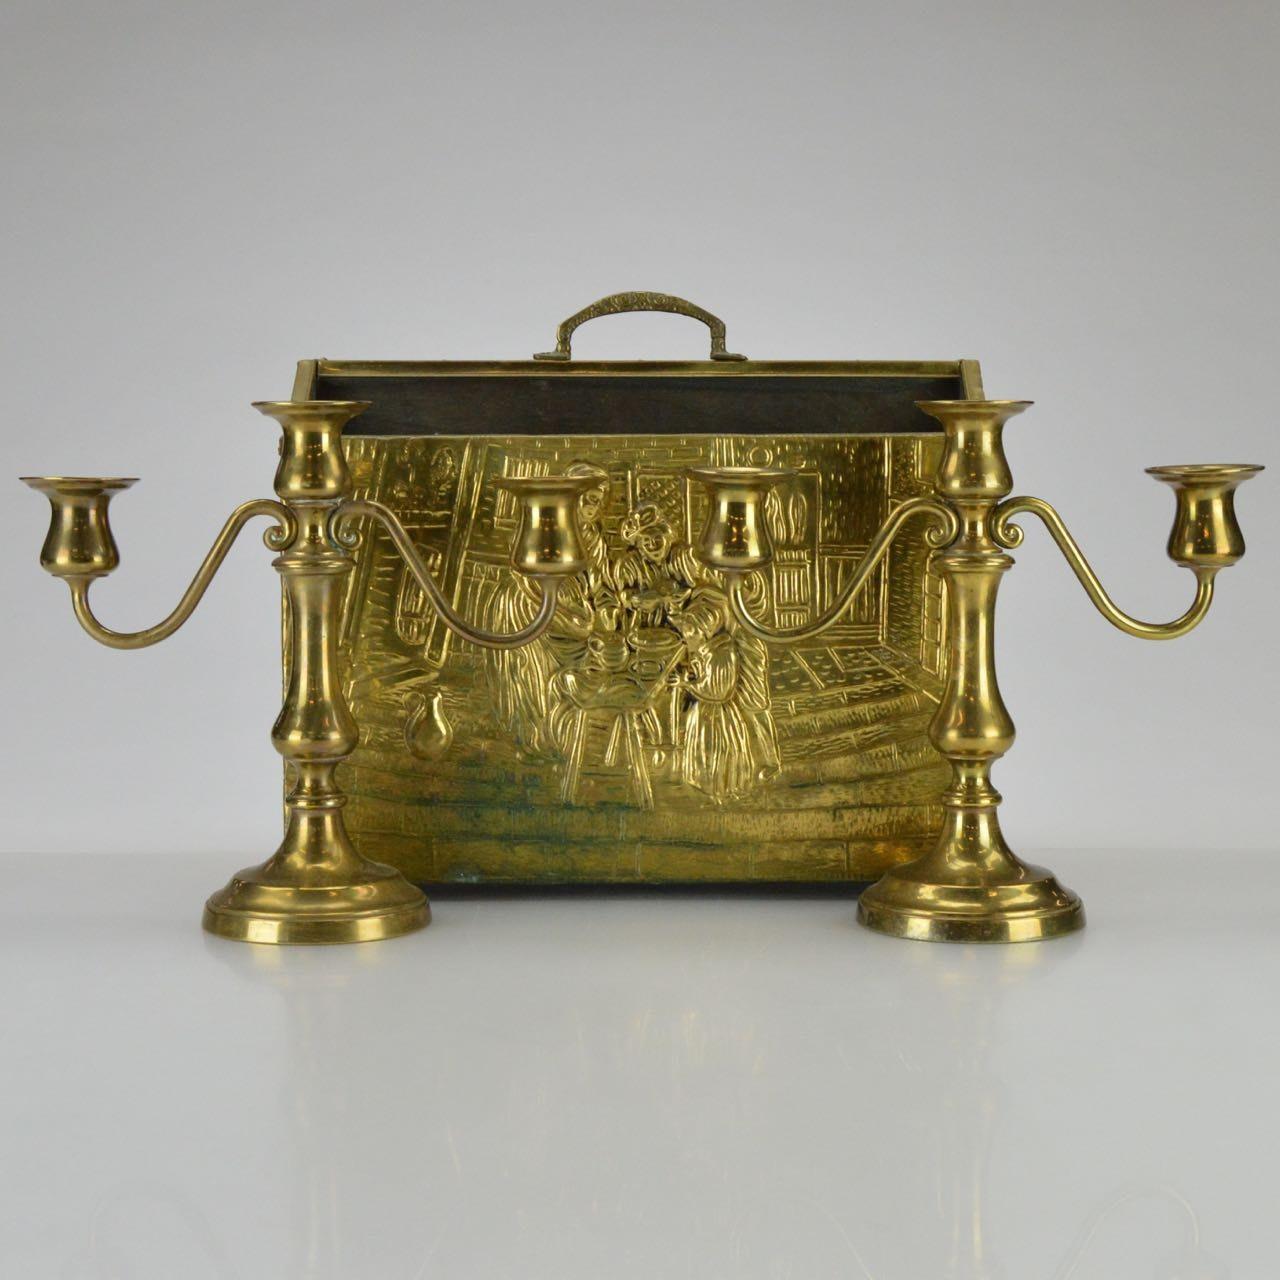 Brass Hearth and Mantel Decor